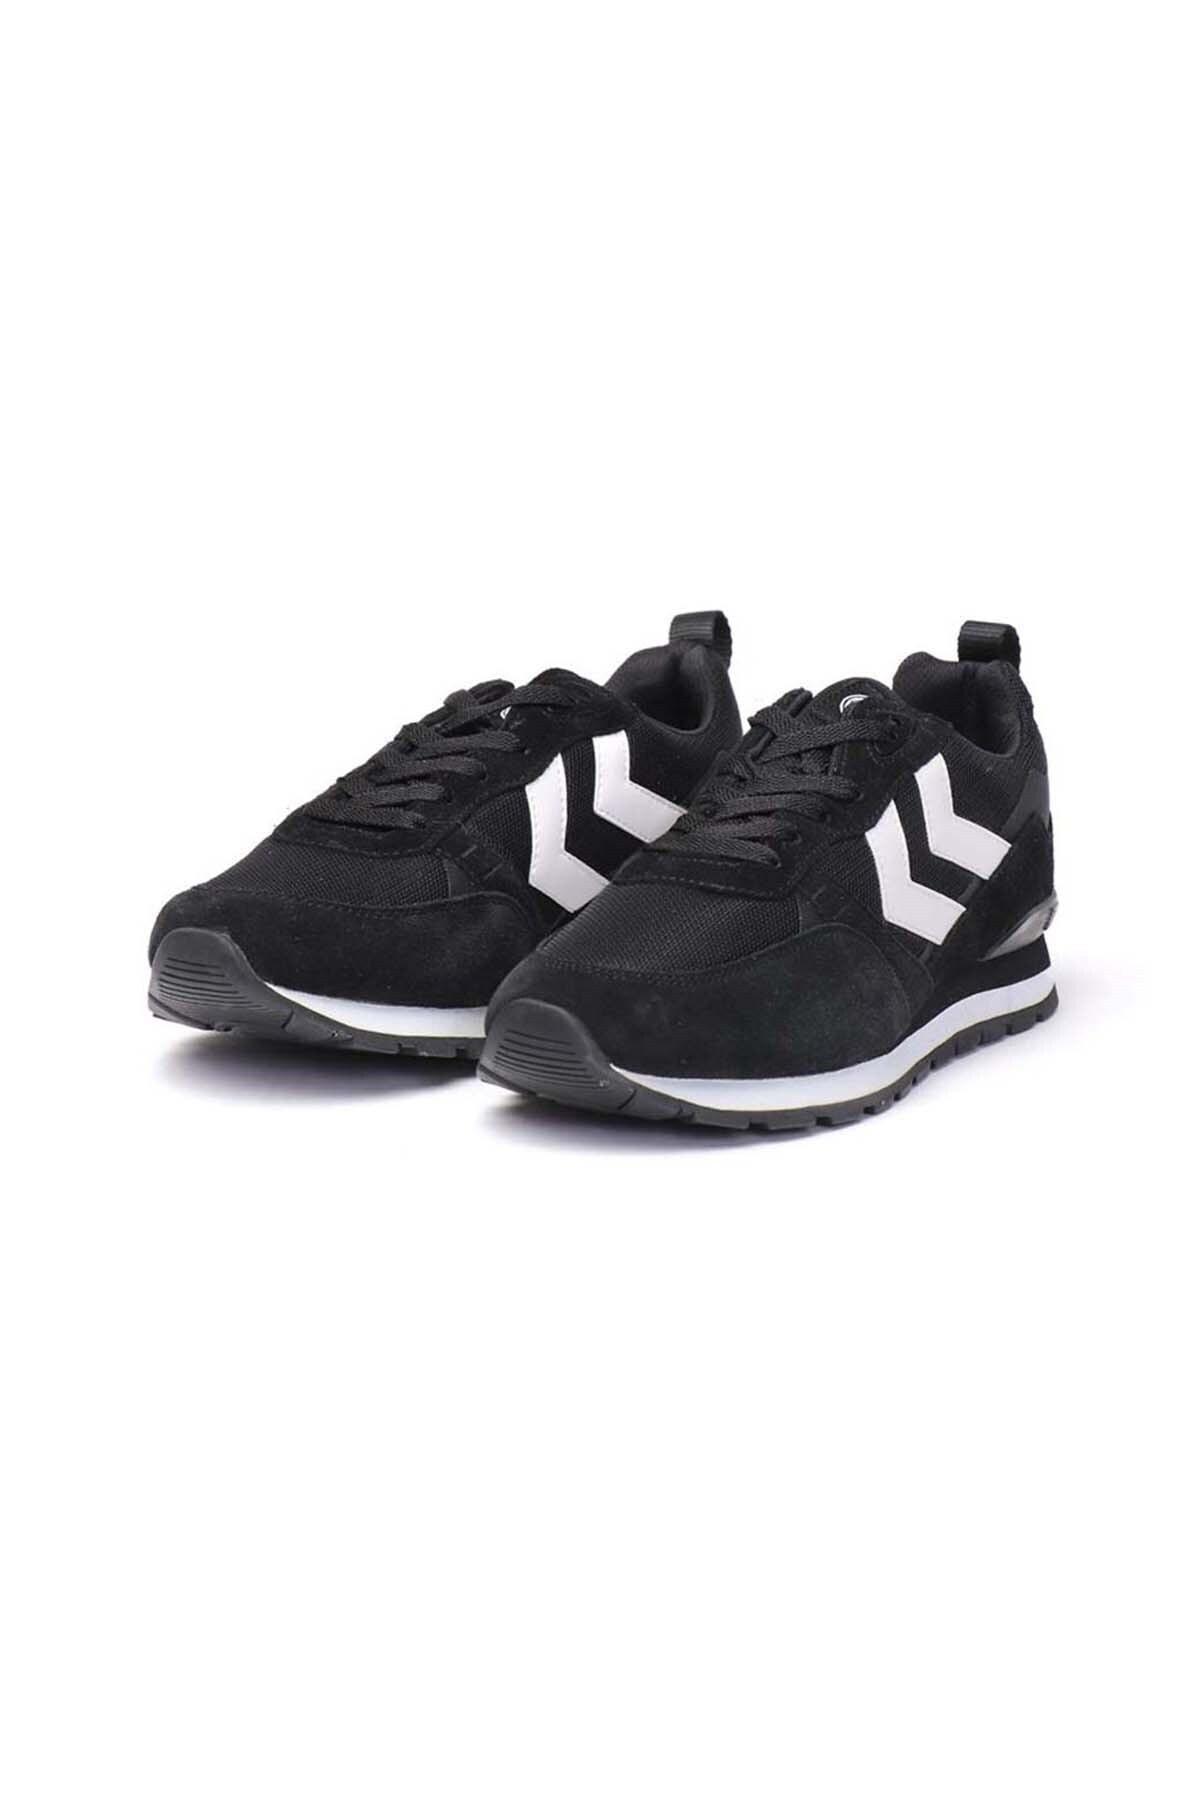 HUMMEL HML THOR Siyah Erkek Sneaker Ayakkabı 101085934 2